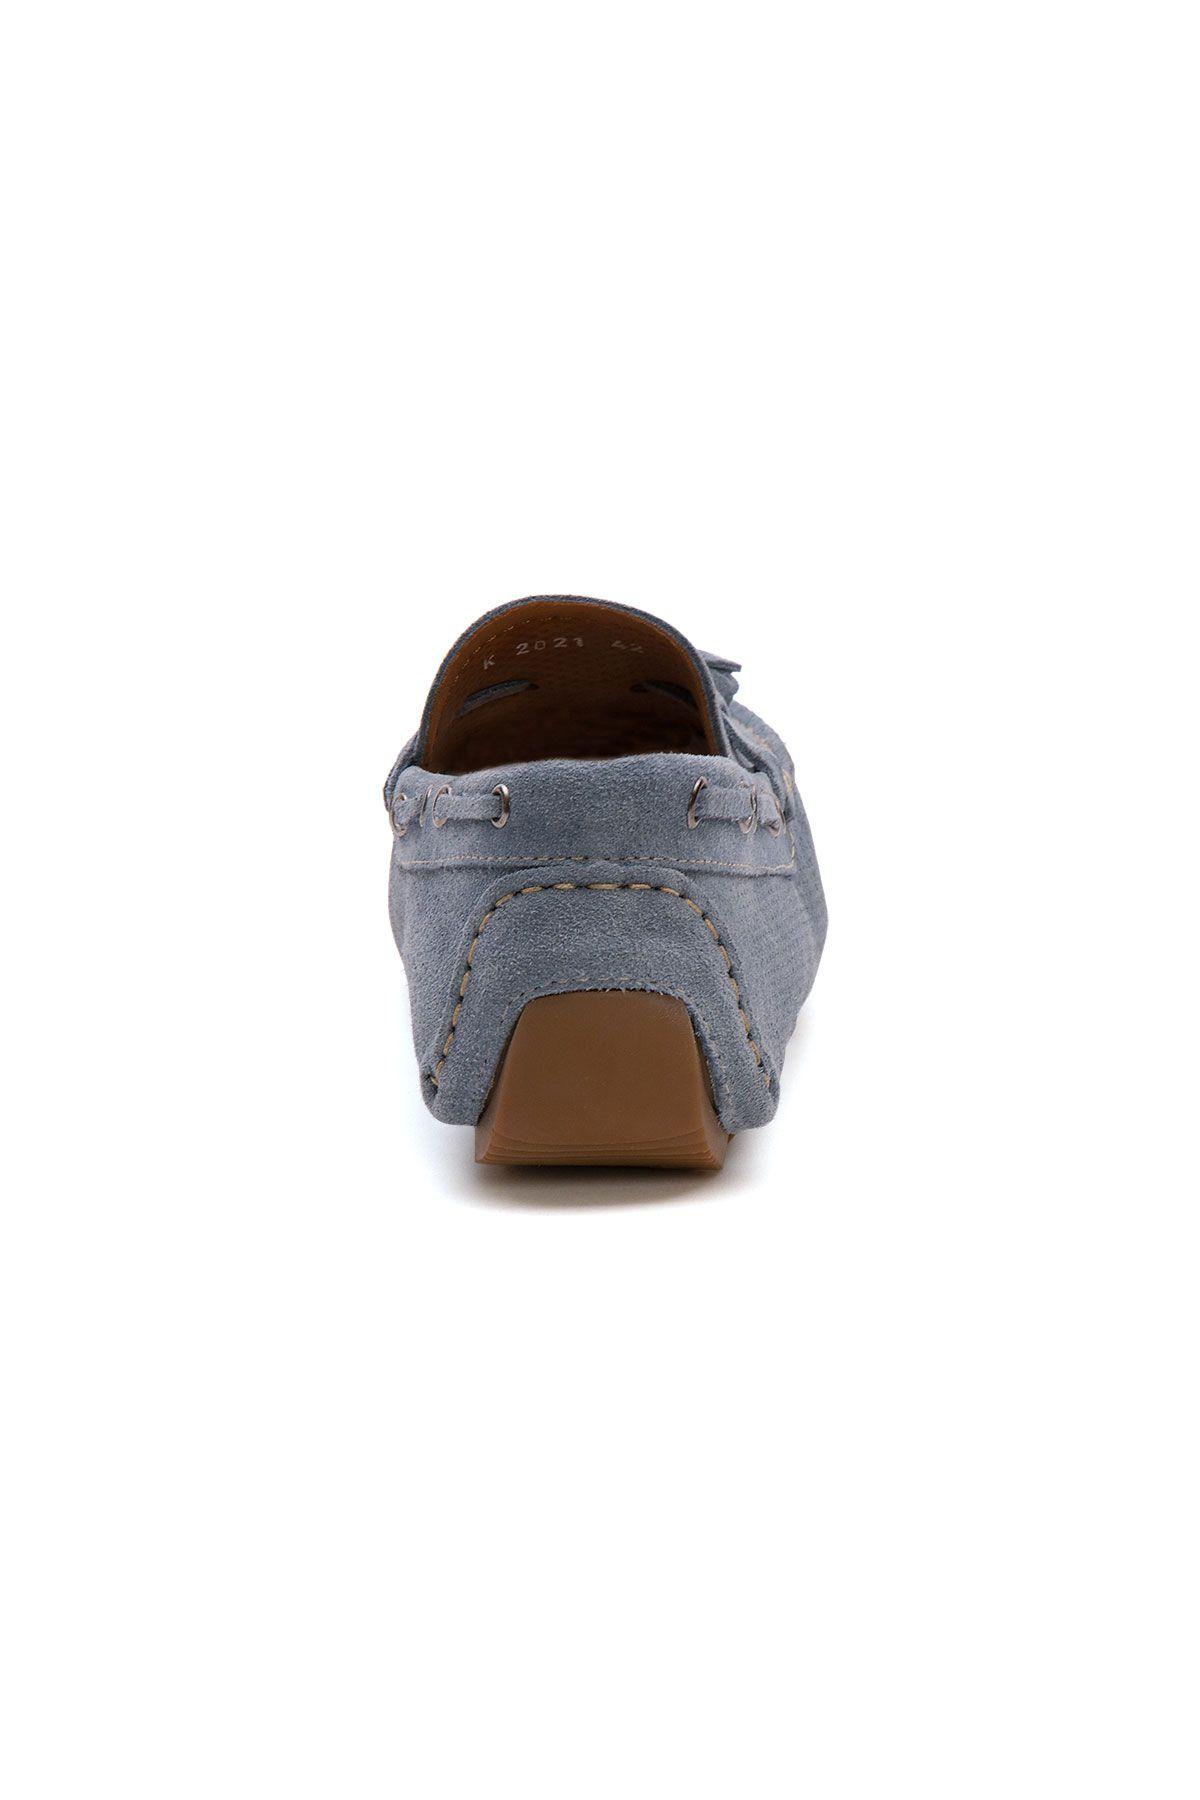 Pegia Genuine Suede Men's Tassel Loafer 500903 Blue